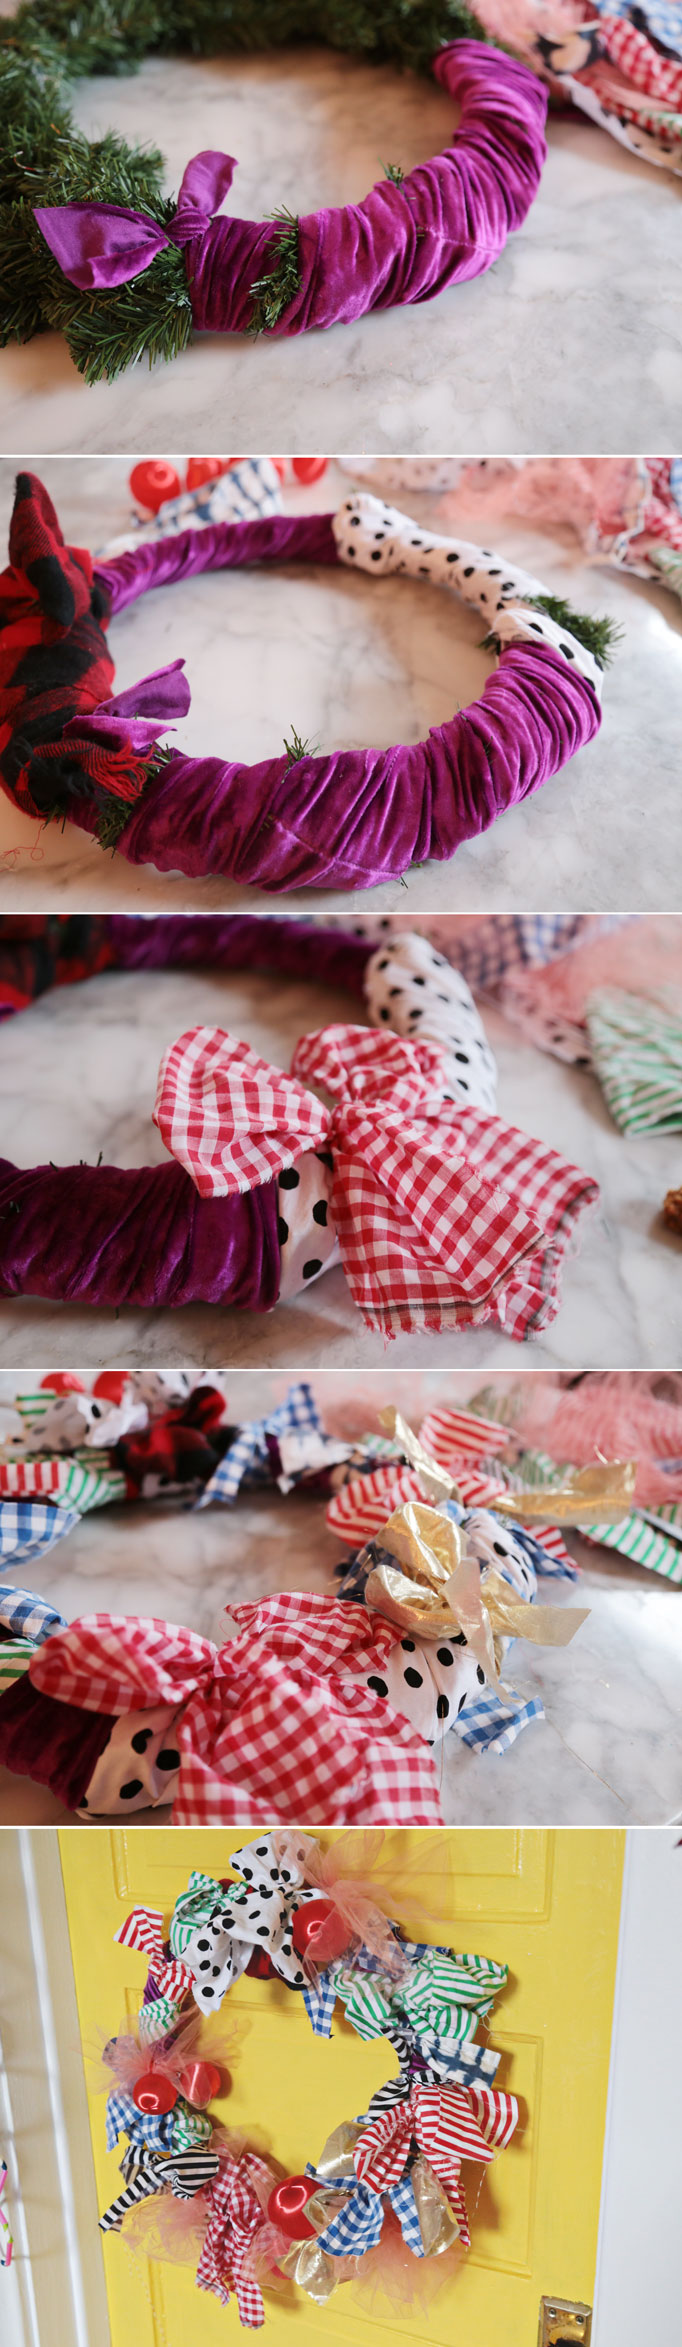 Punky-Brewster-rag-wreaths-682